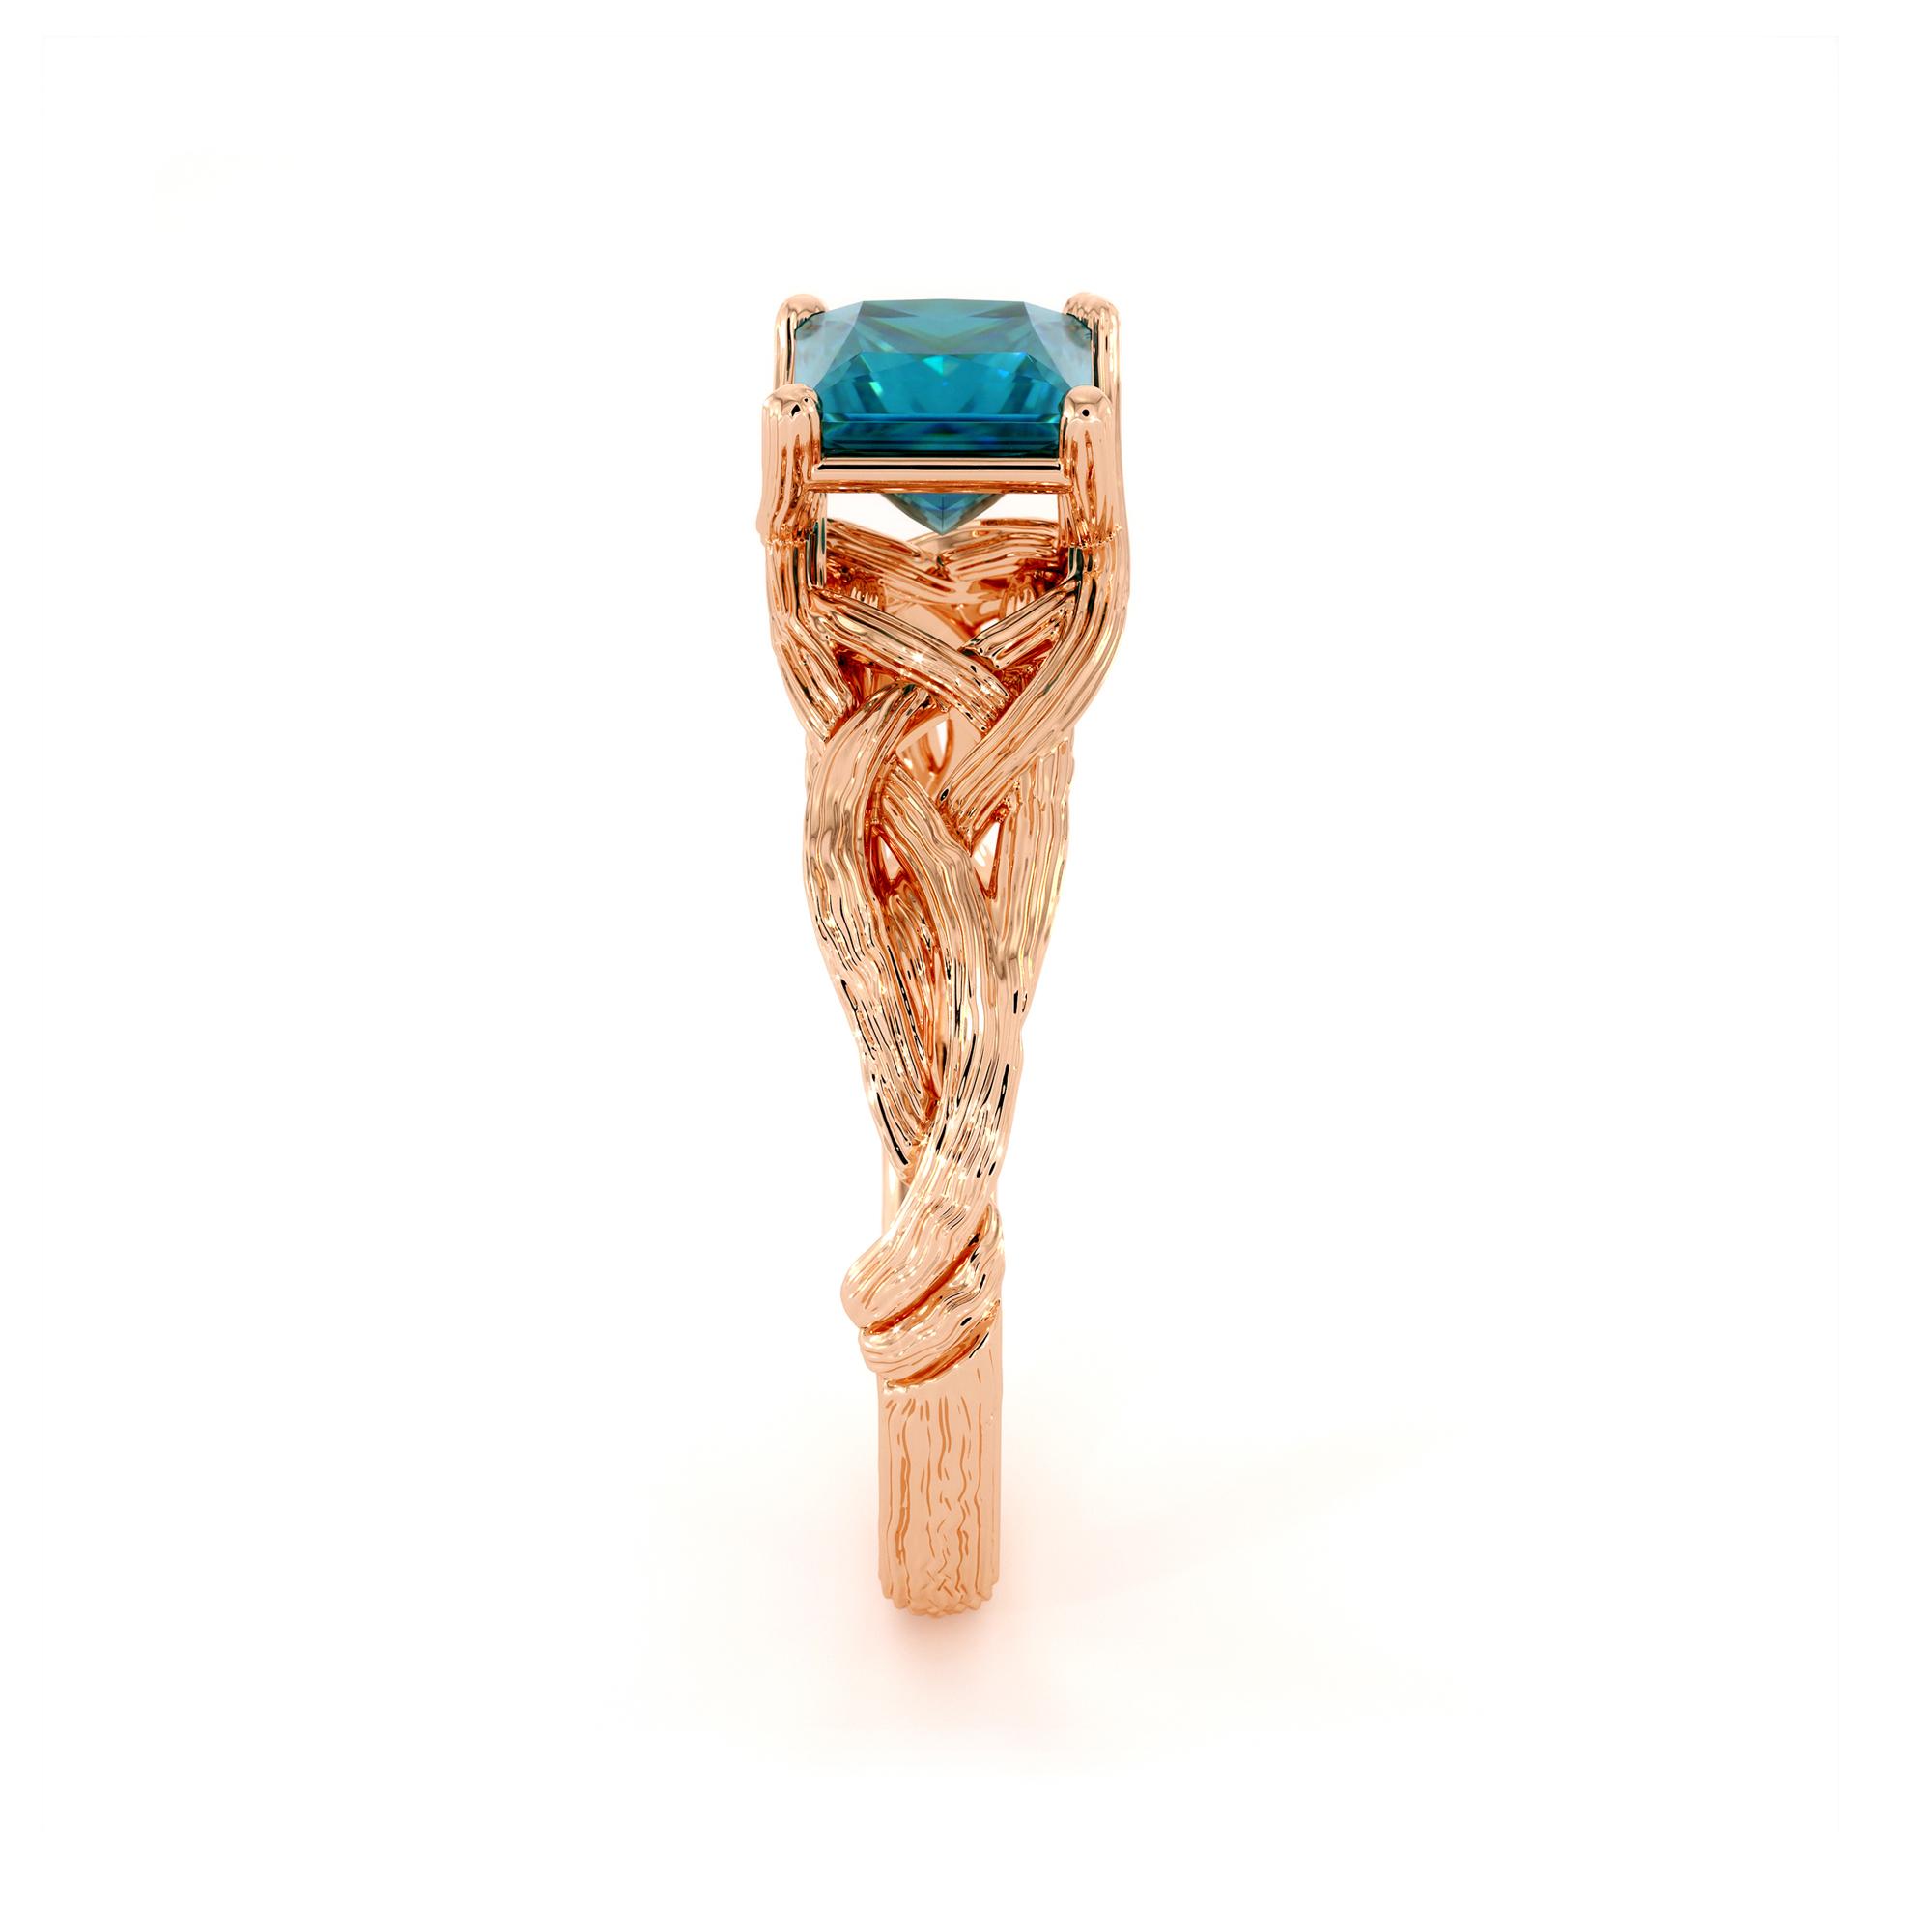 Twisted Branch Blue Diamond Ring 14K Rose Gold Nature Ring Princess Cut Diamond